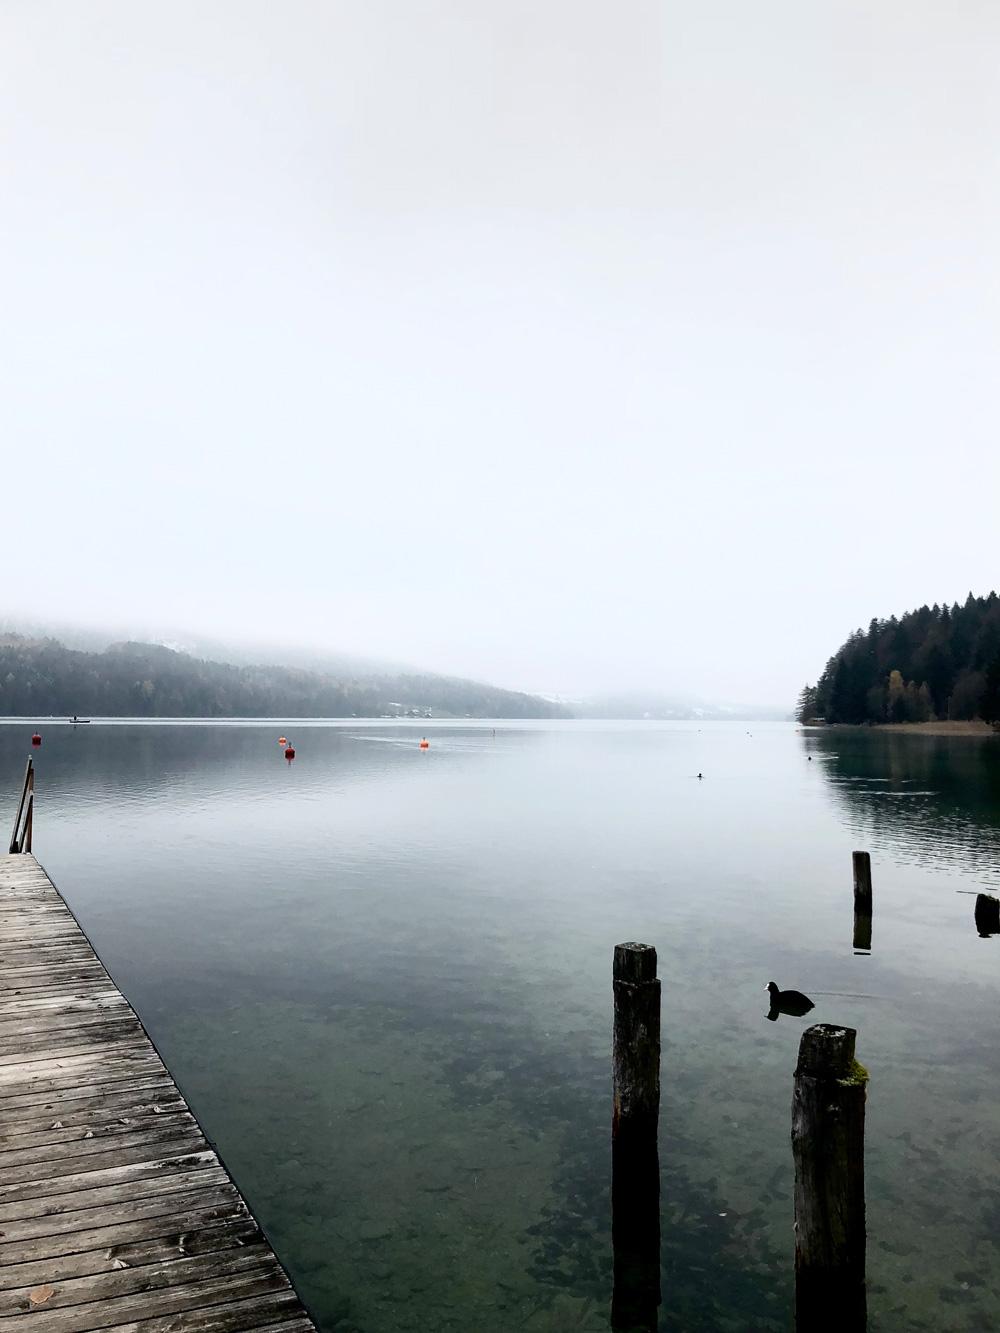 Eva-Jasmin-Fuschlsee-See-Natur-Ebners-Waldhof-Spa-Wellness